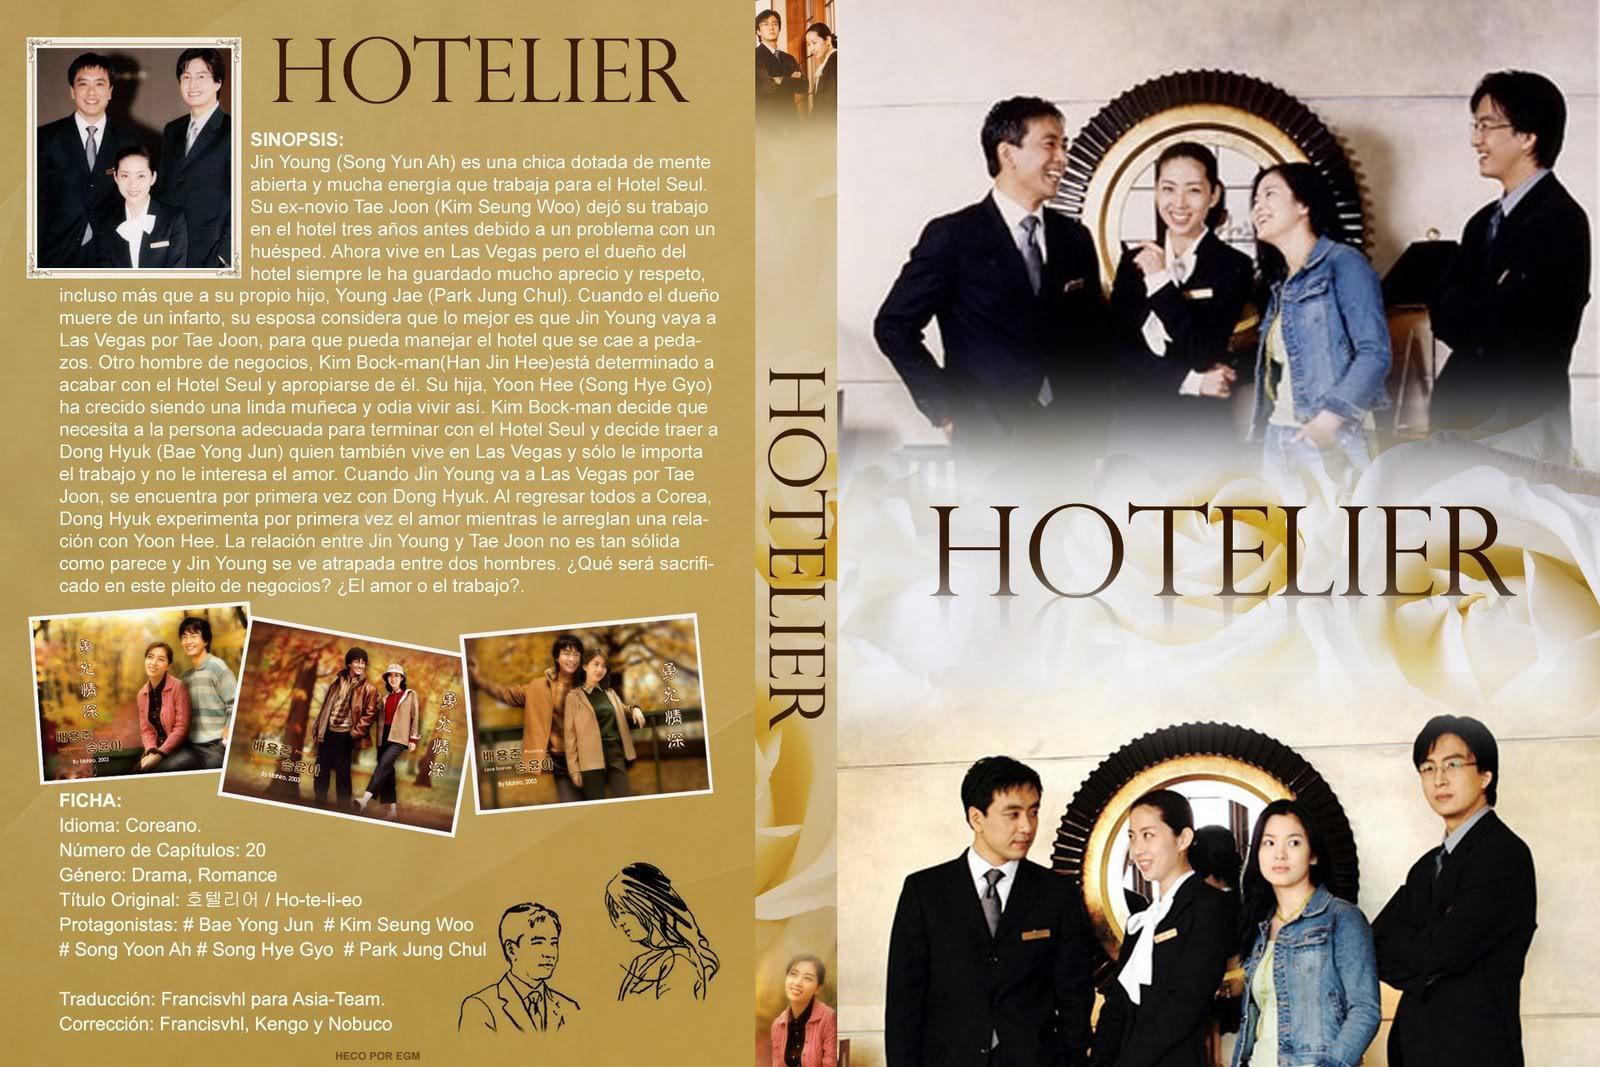 The Hotelier - Facebook